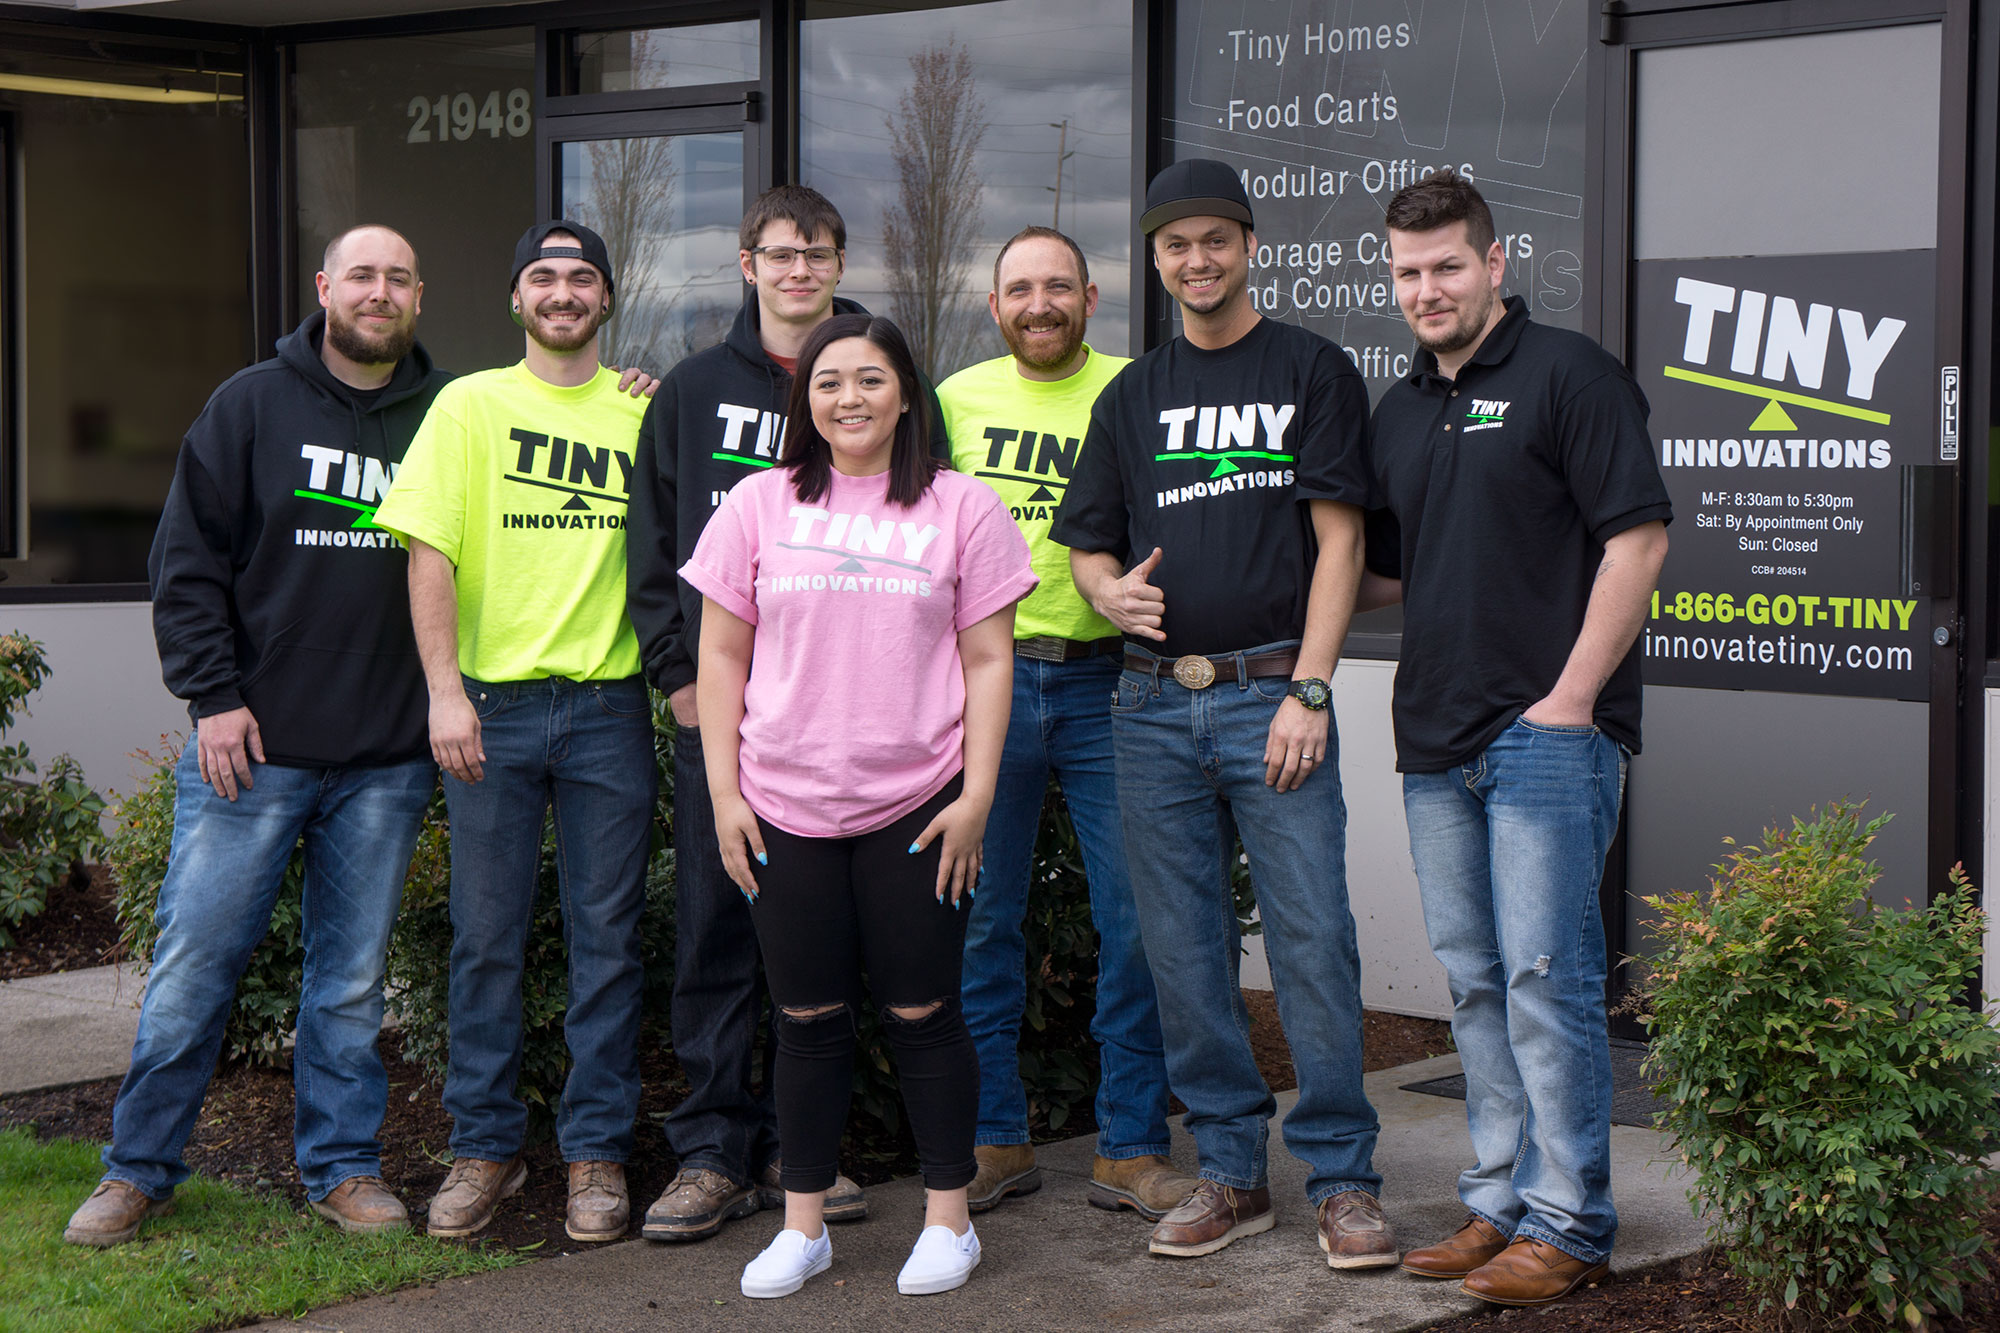 The Tiny Innovations team